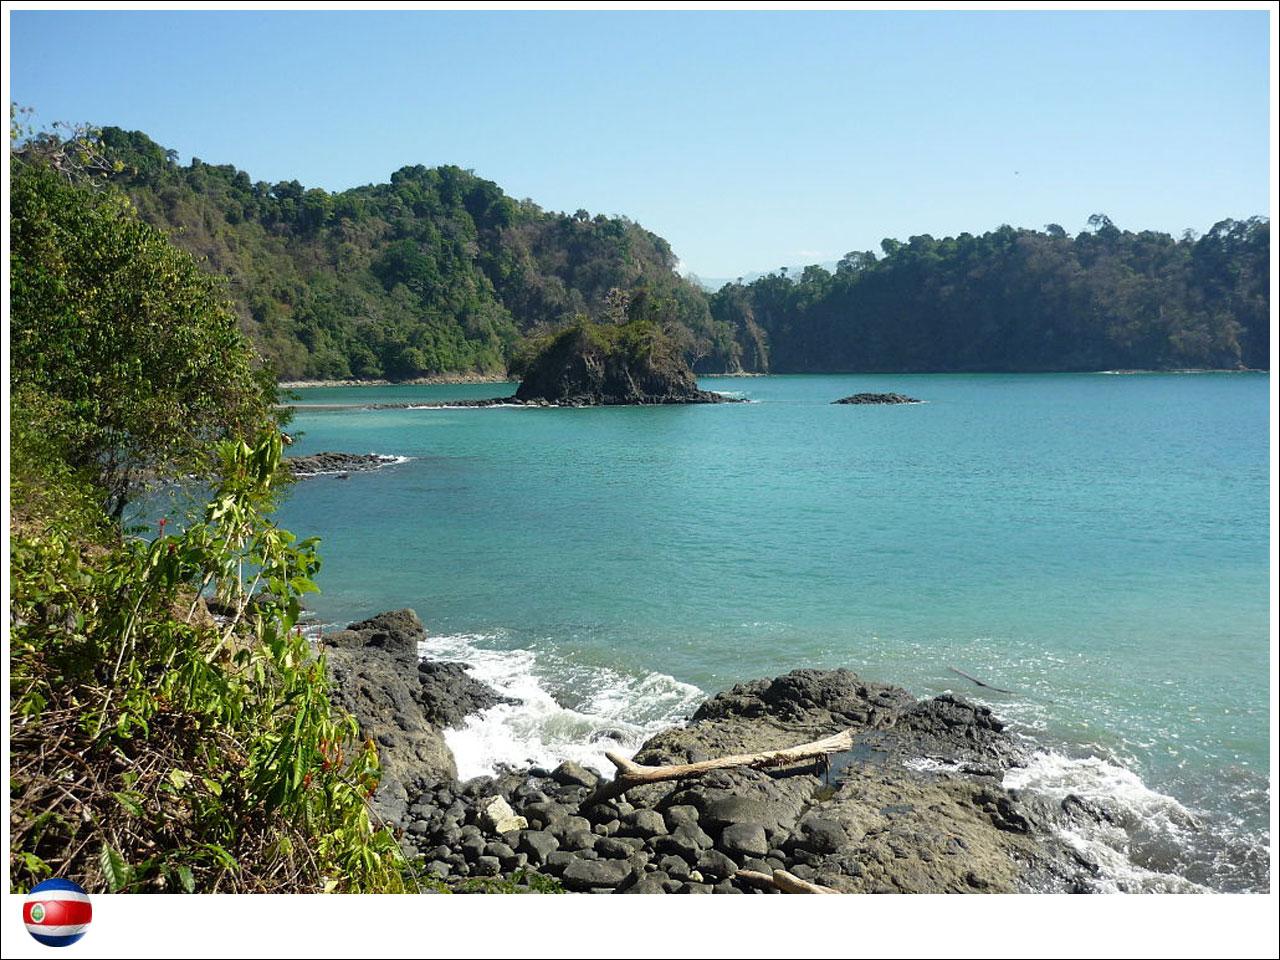 copa-protegida-costa-rica-071